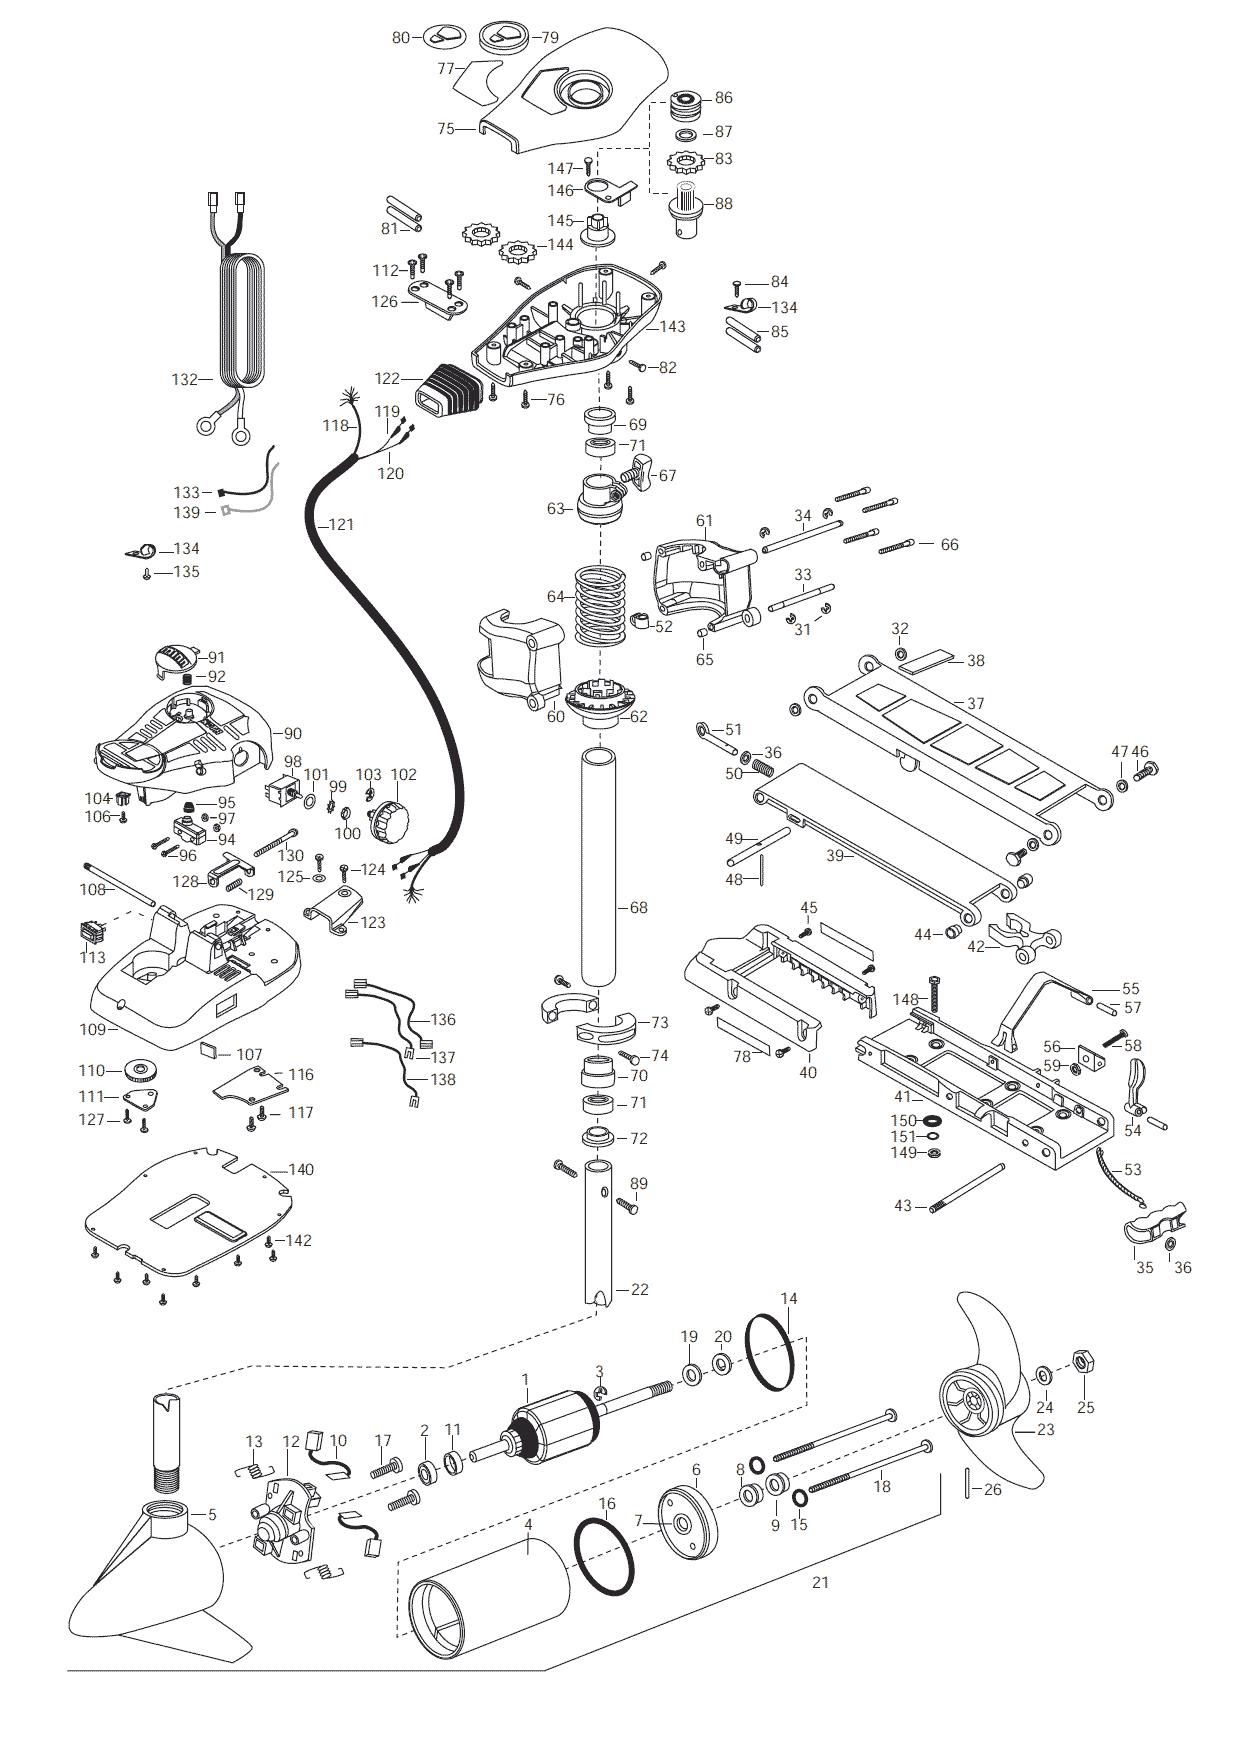 Minn Kota Endura 40 Wiring Diagram Minn Kota Power Drive